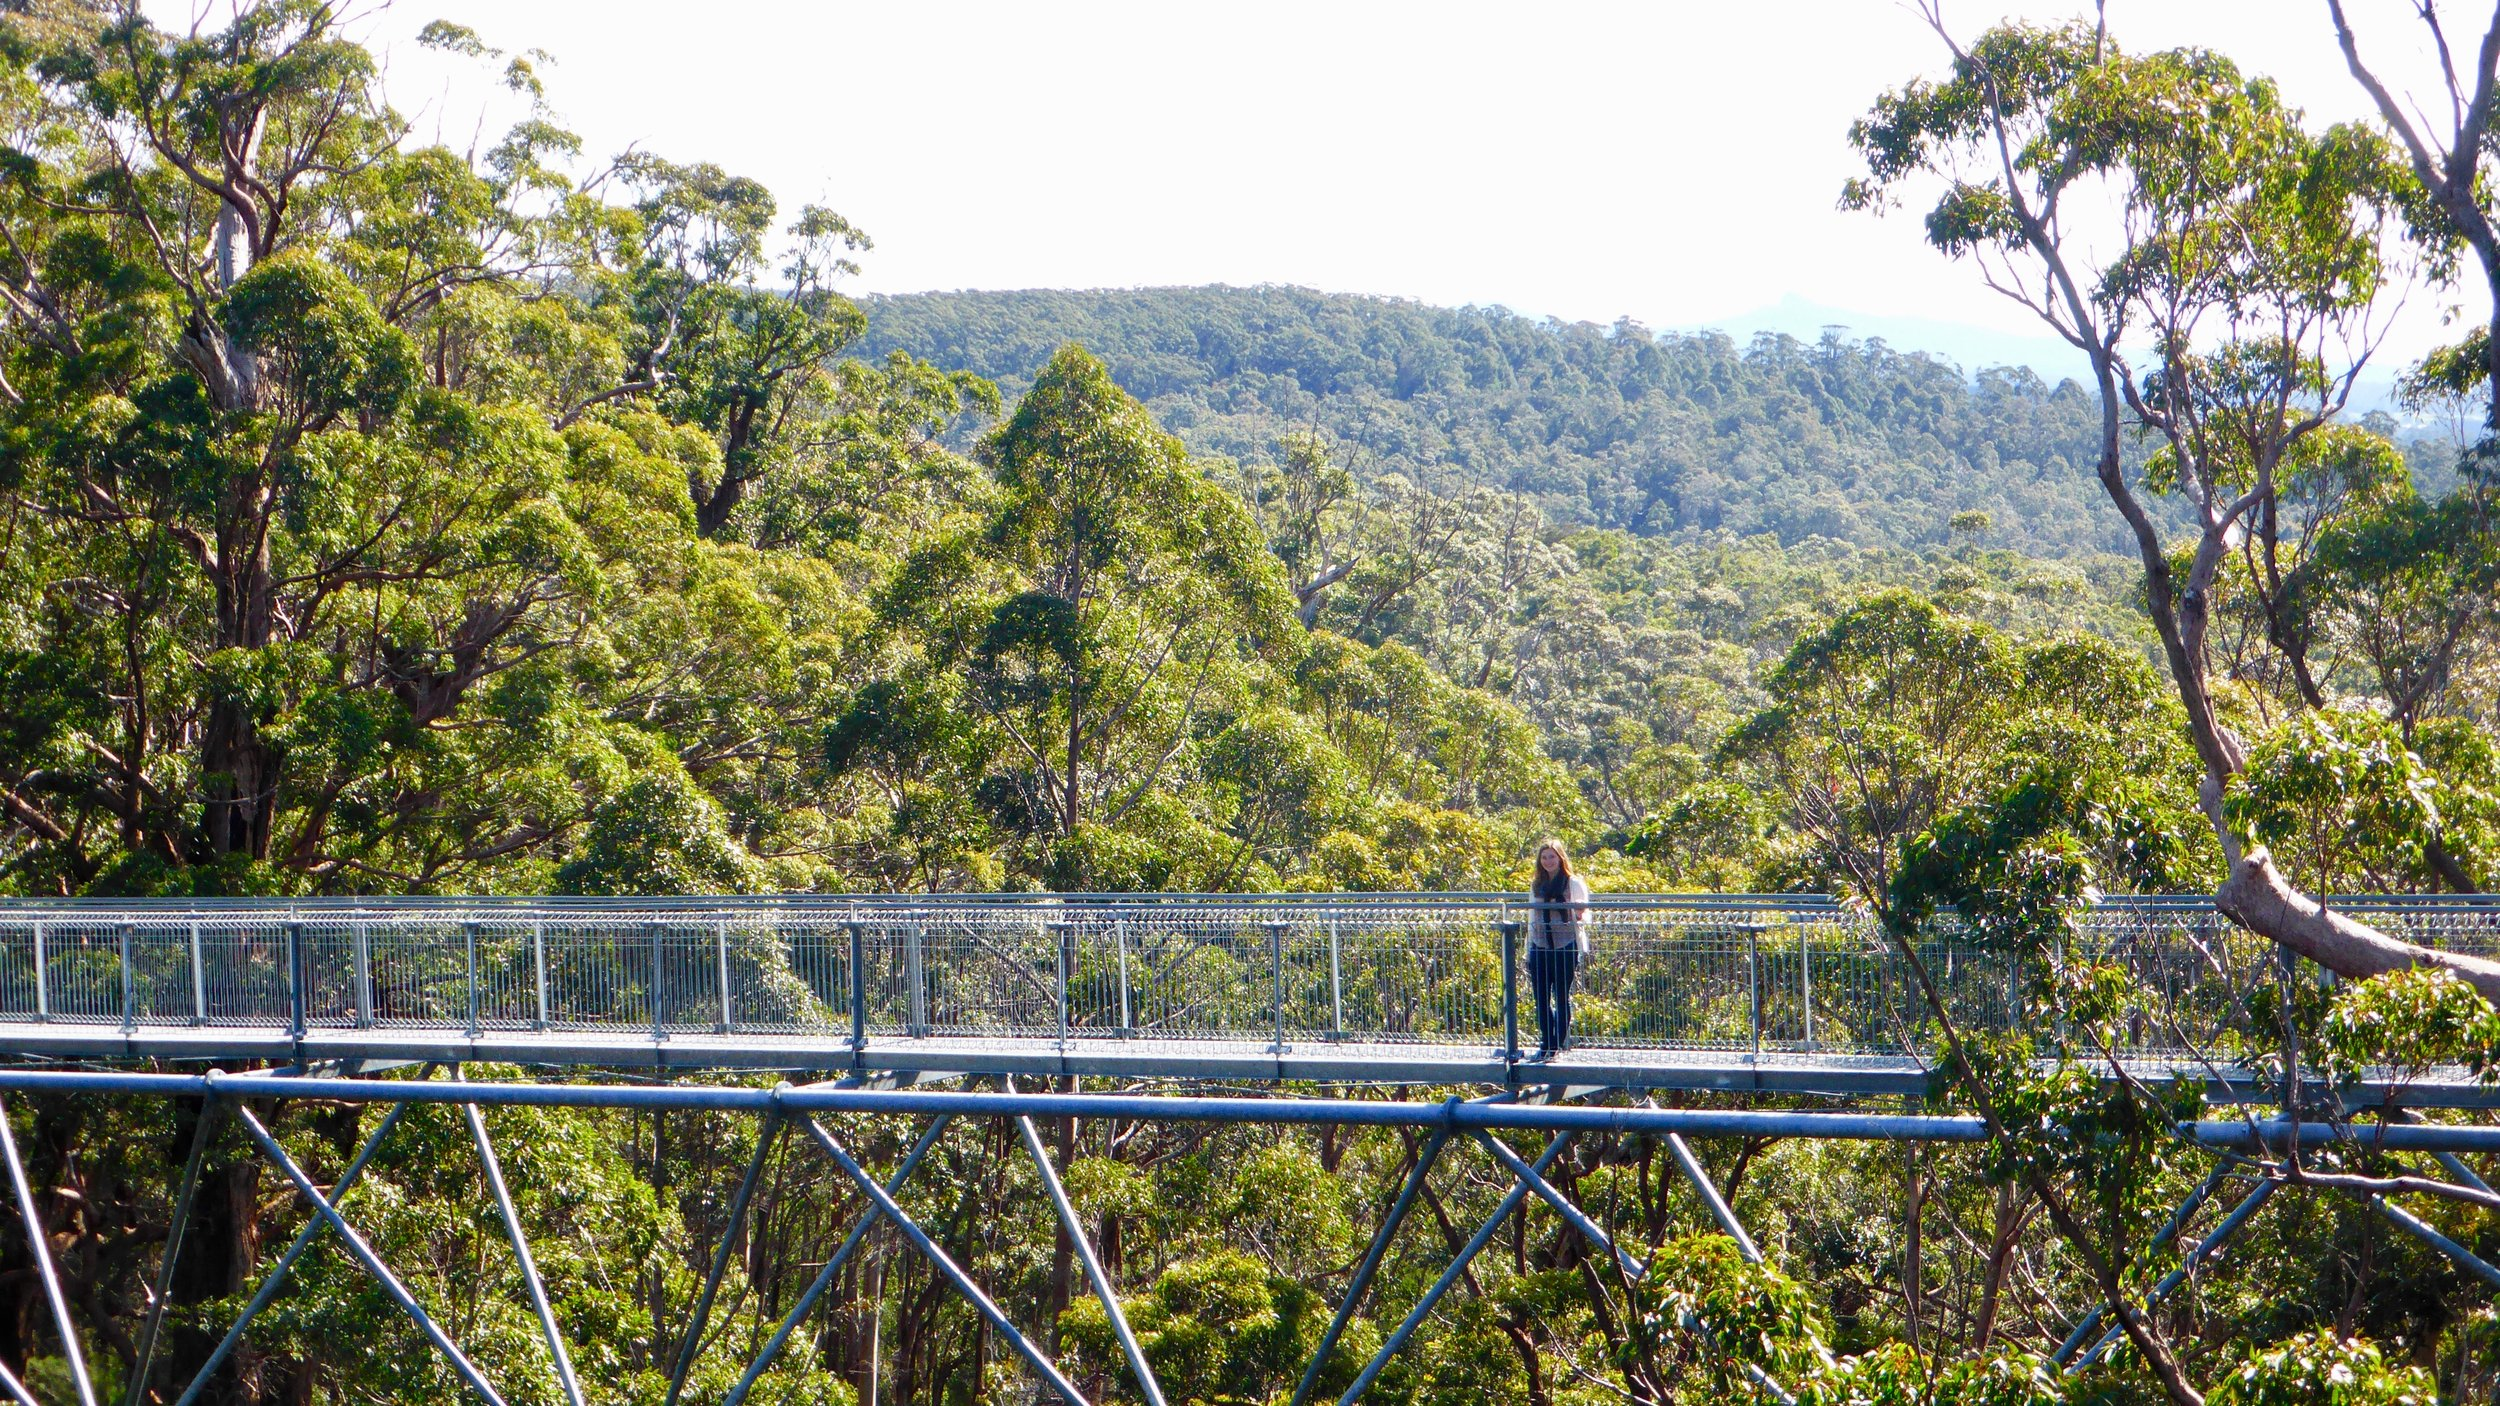 Valley of the Giants tree top walk, Western Australia @acrosslandsea